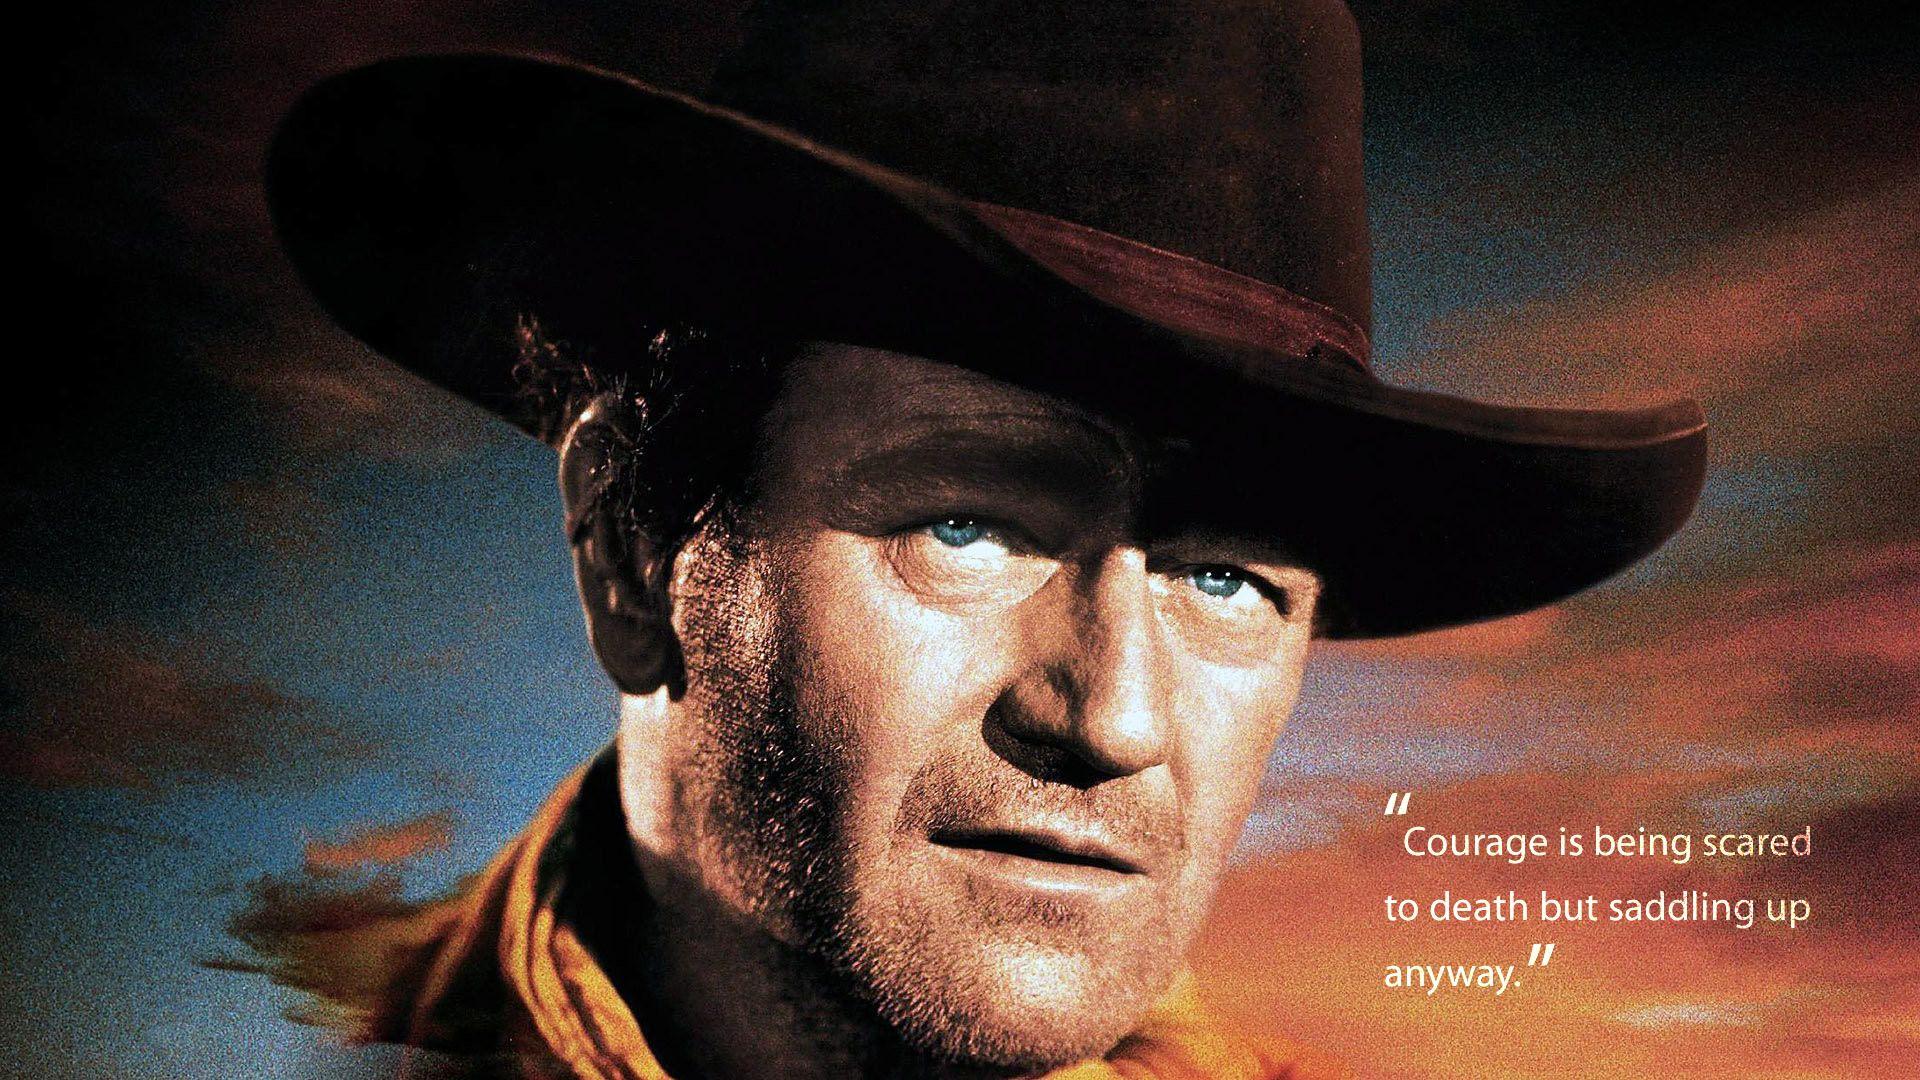 John Wayne Courage Quote Hd Wallpaper Fullhdwpp Full Hd Wallpapers 1920x1080 John Wayne Western Movies John Wayne John Wayne Quotes